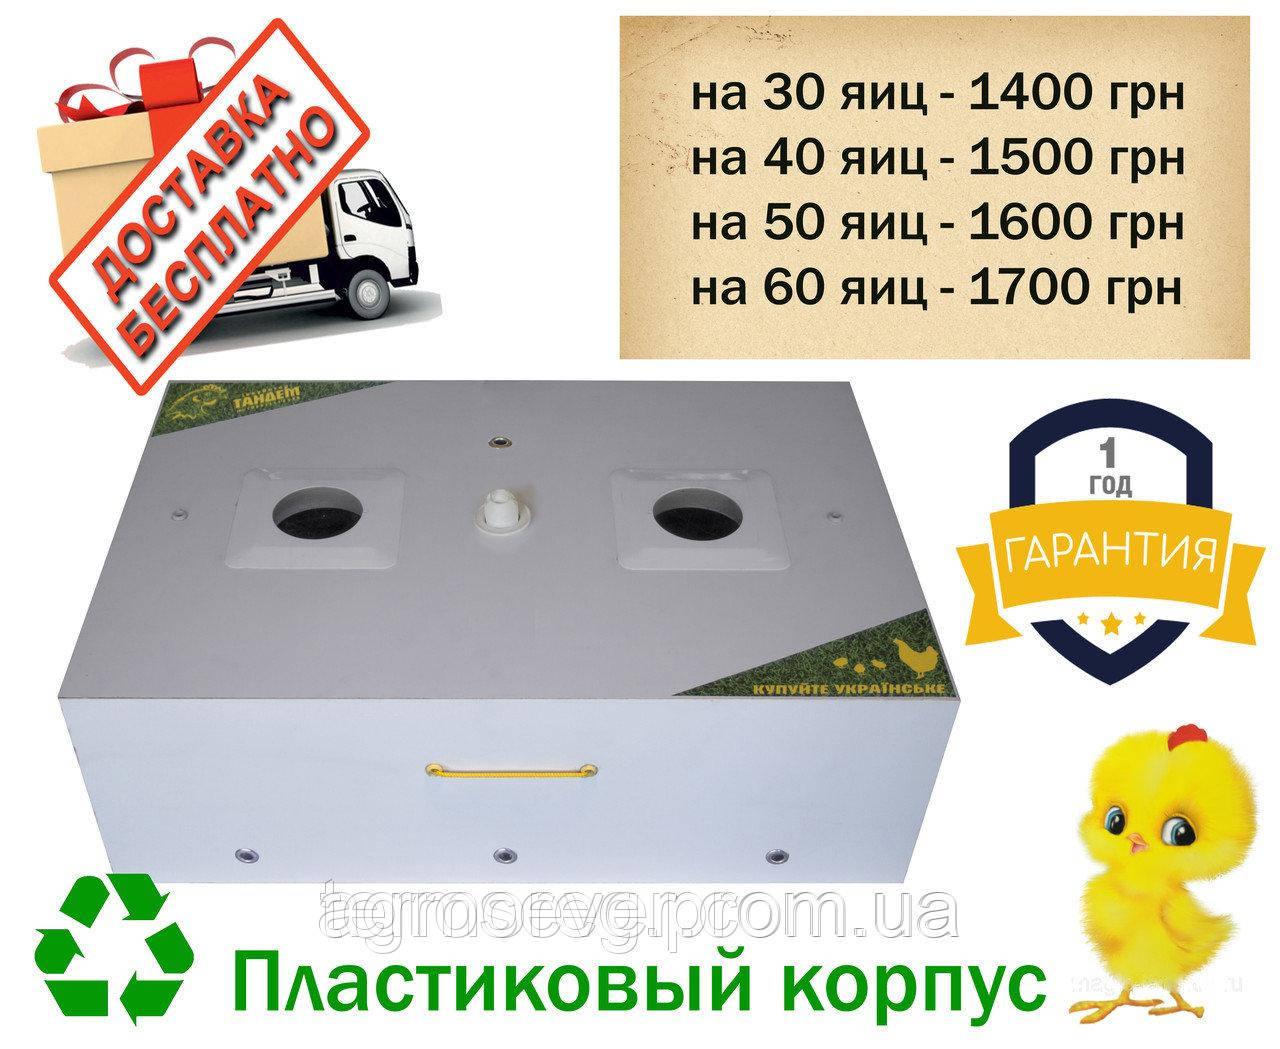 Инкубатор Тандем mini 60 термокабель на 60 куриных яиц